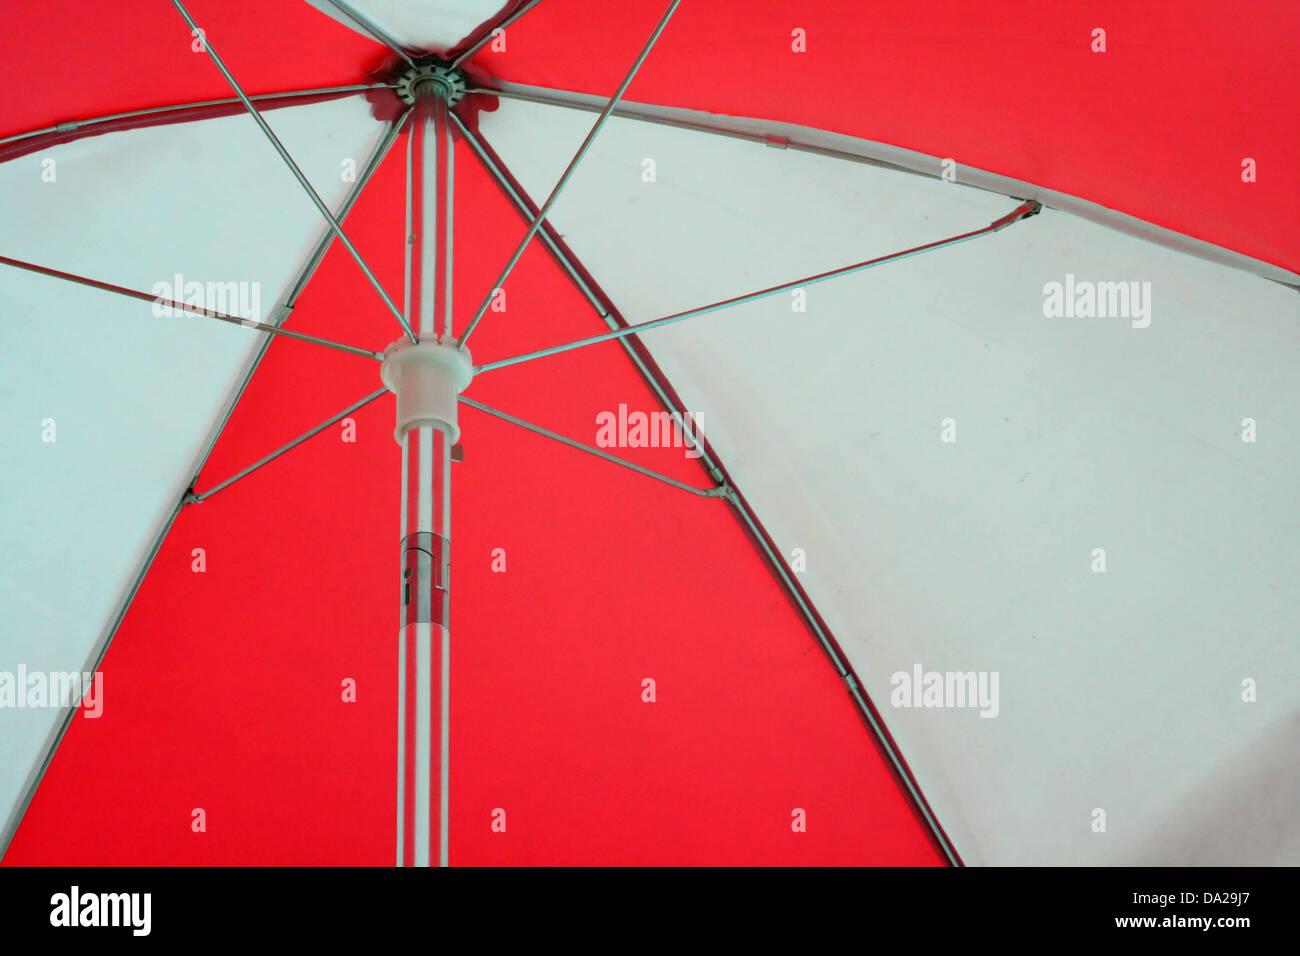 rot weißen Schirm Strand Sonne Regen Rettungsschwimmer Rettungsschwimmer Sonnenschirme Wettervorhersage Stockbild